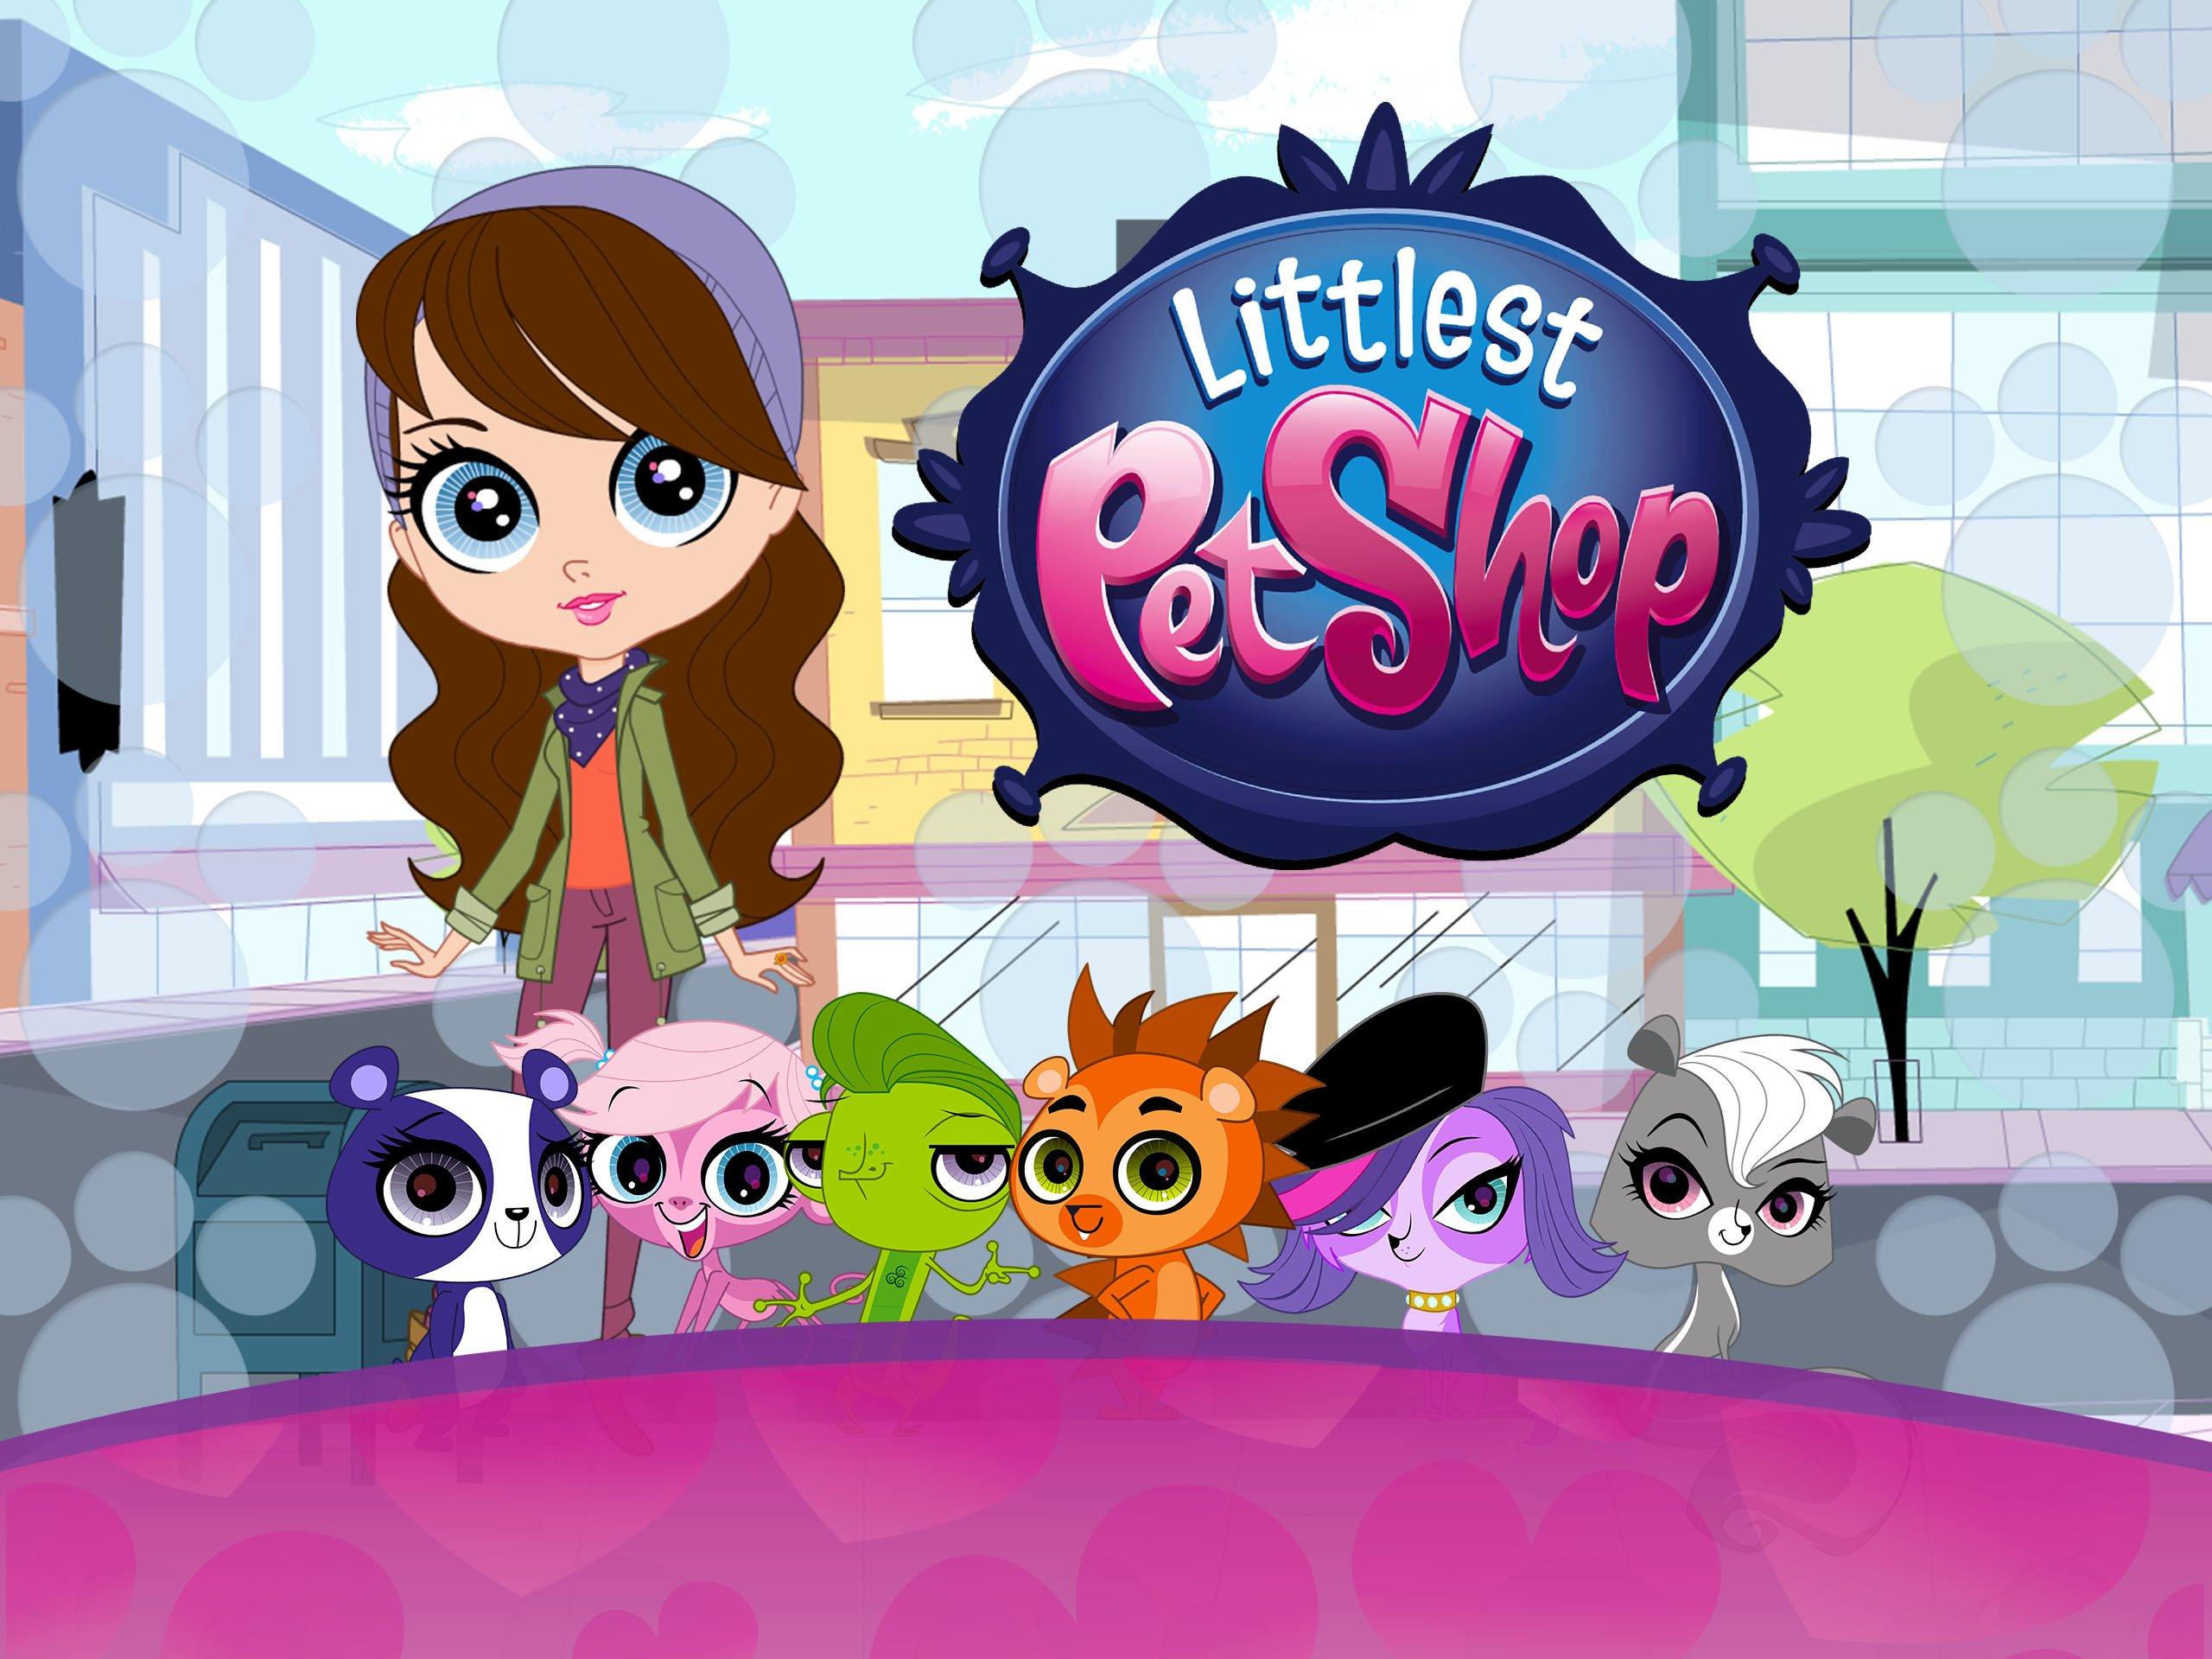 Watch Littlest Pet Shop Season 3 Volume 2 Prime Video